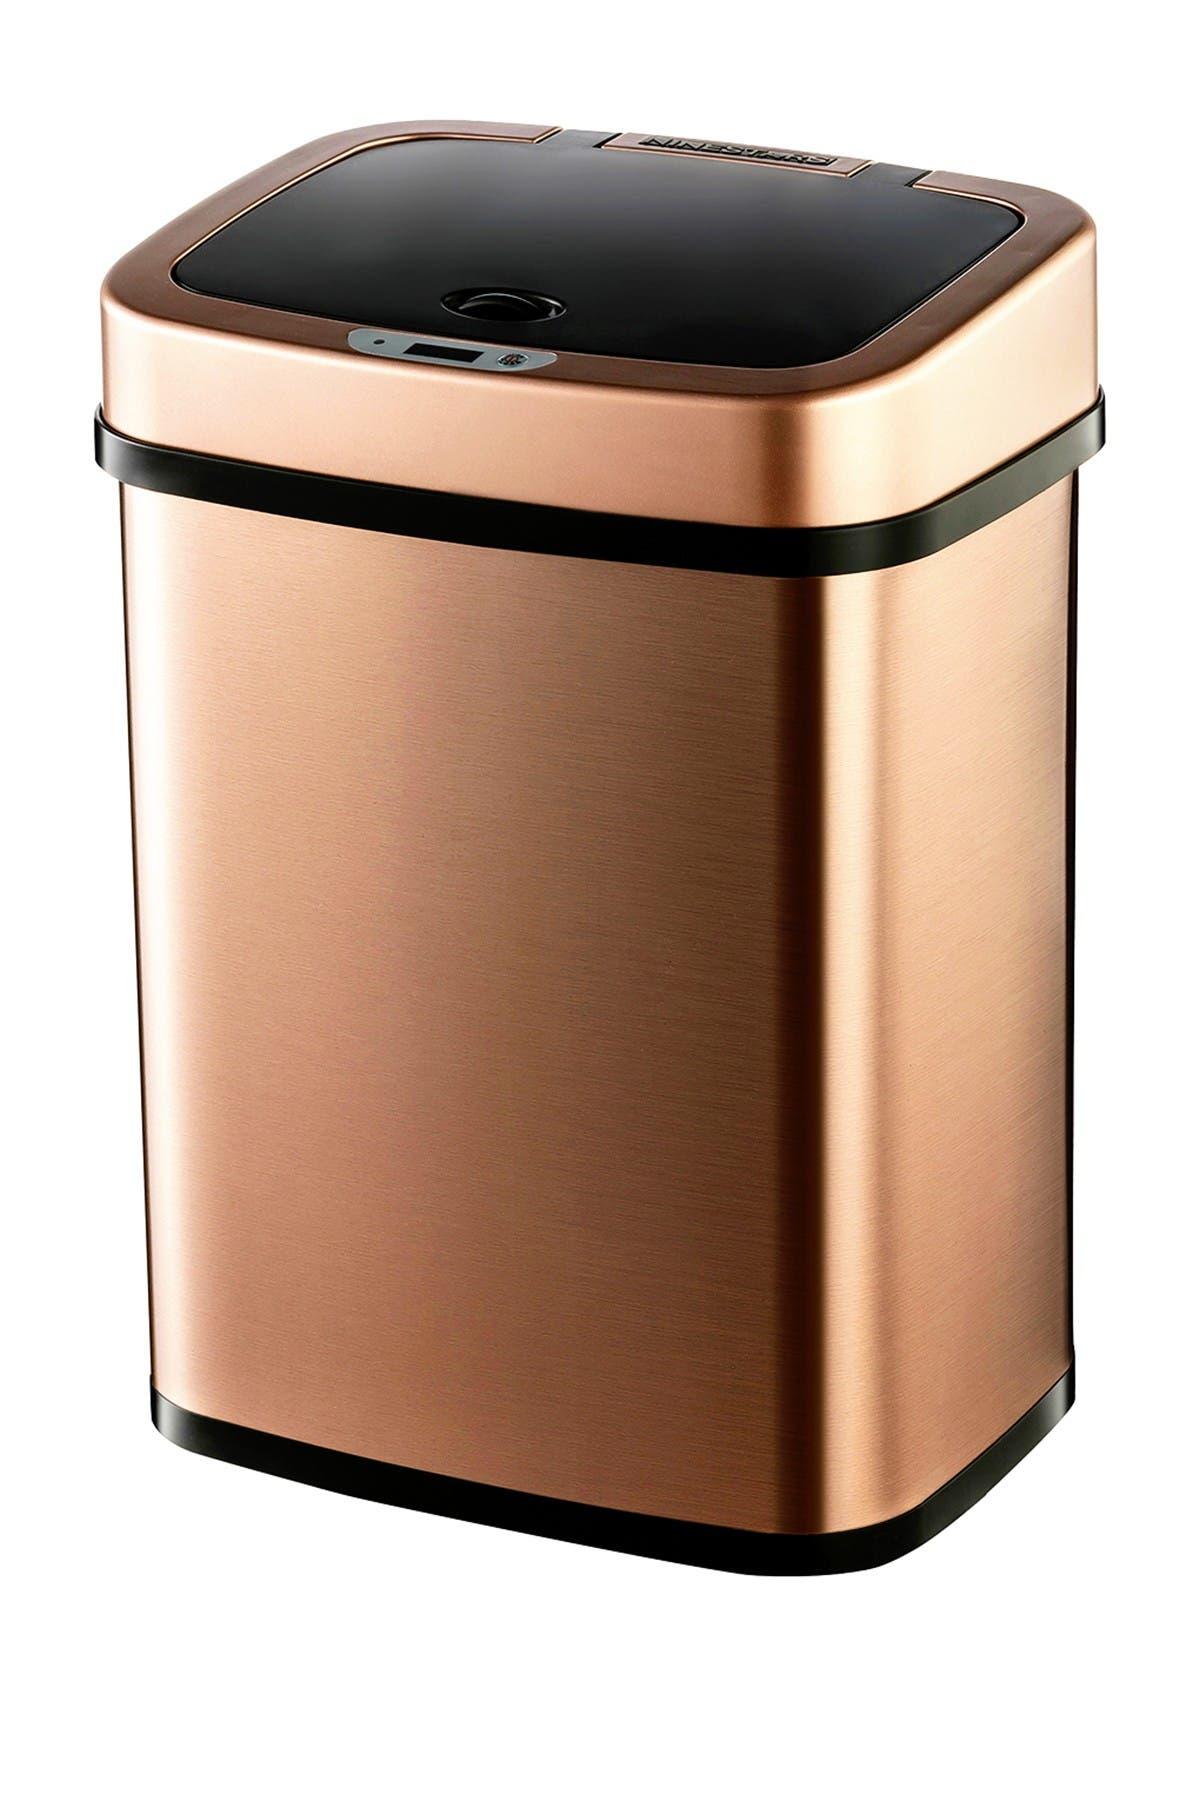 Image of NINESTARS Gold Motion Sensor Trash Can - 3.1 gallons